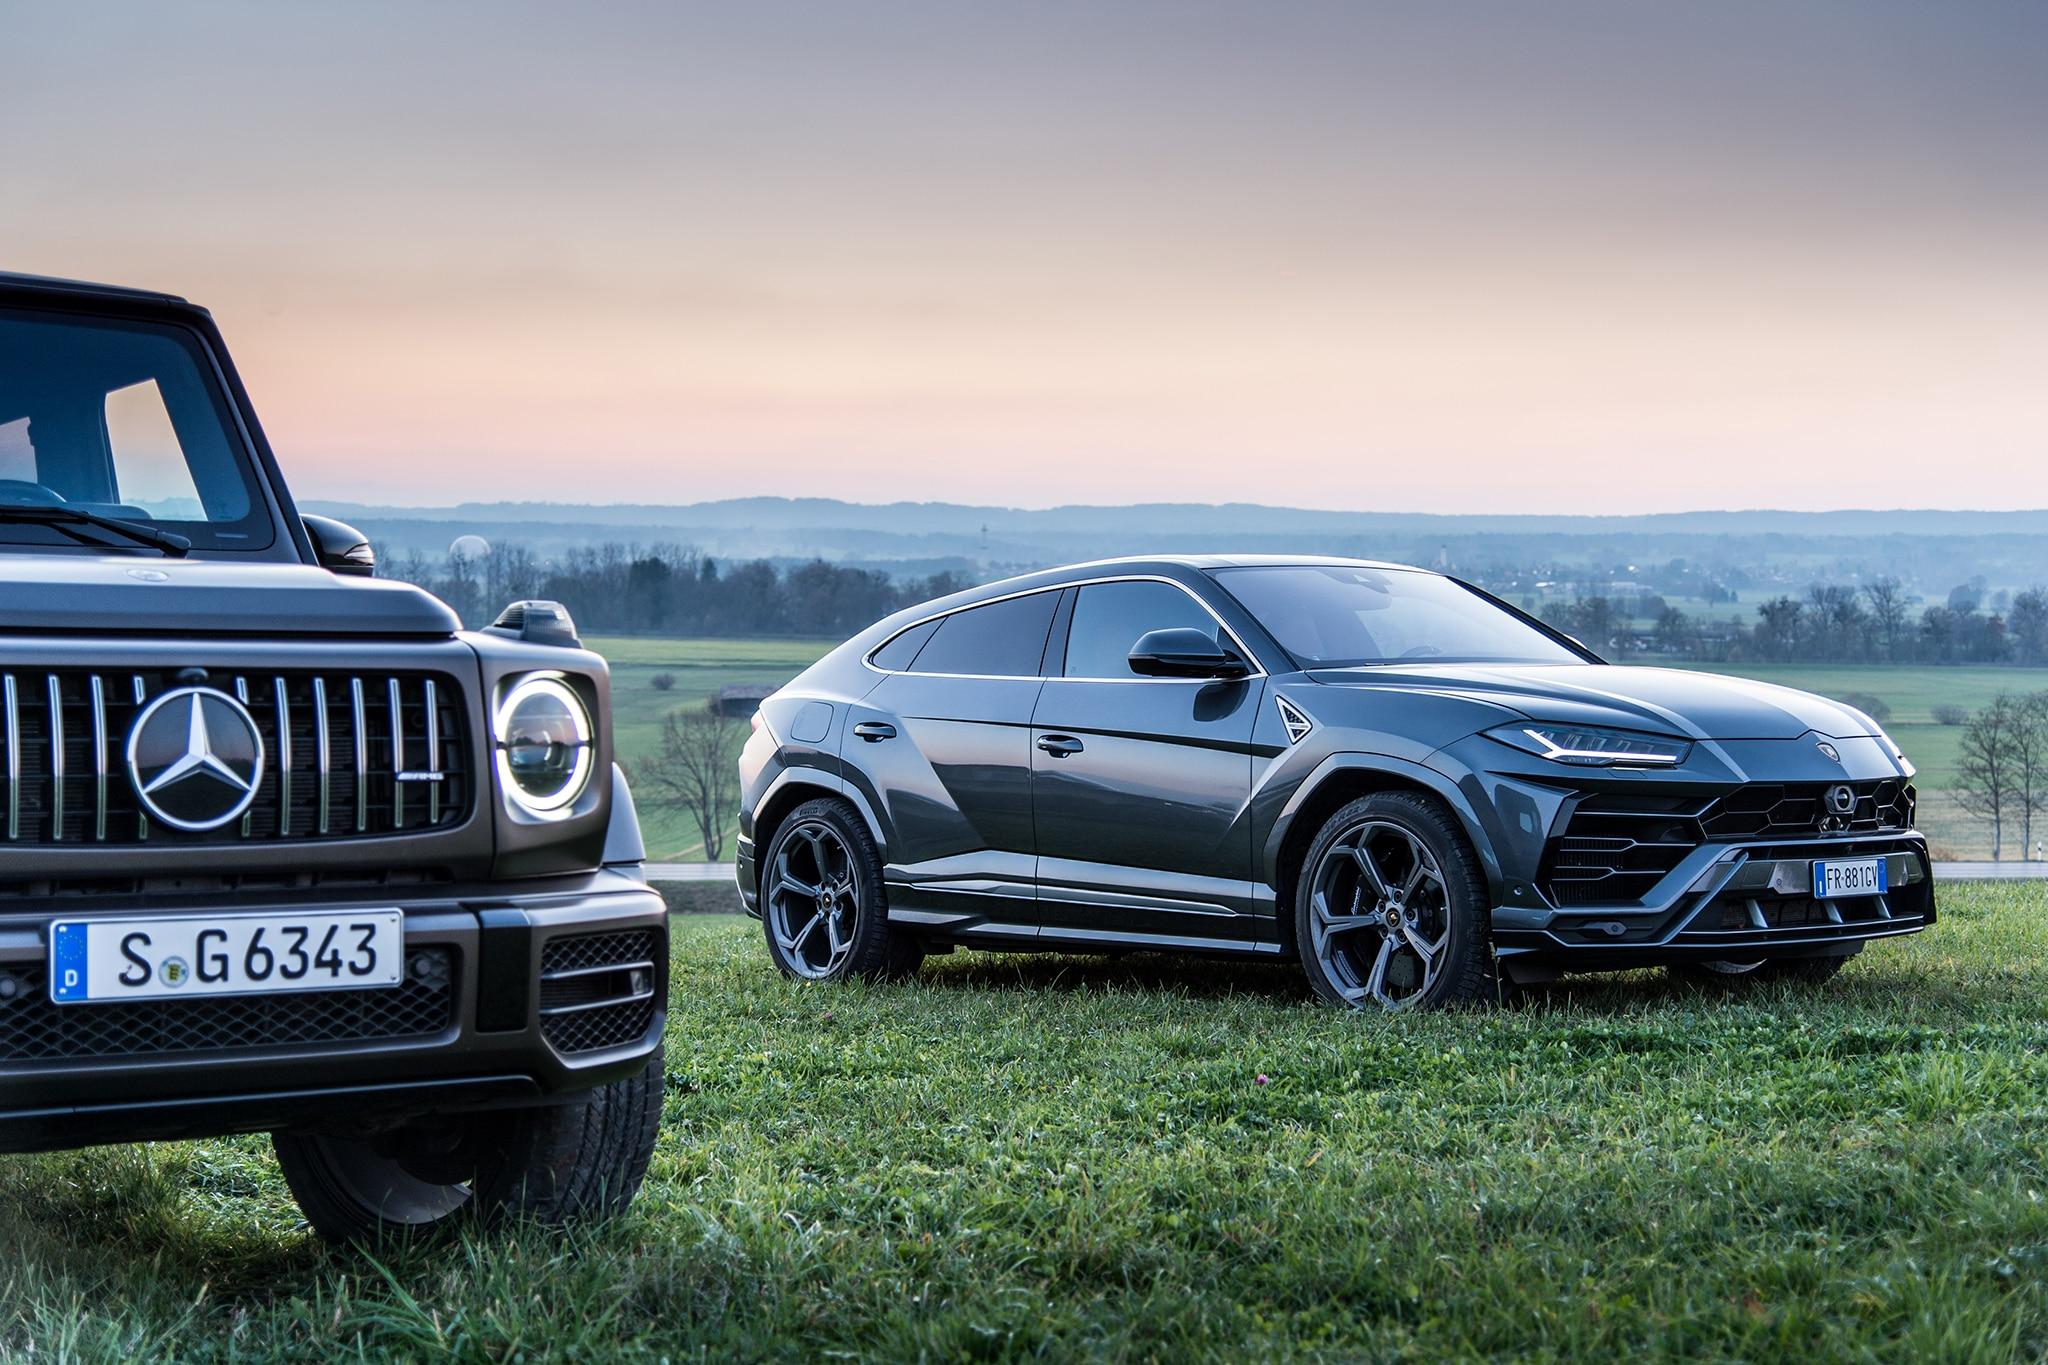 Big-Buck SUVs: Lamborghini Urus vs  G63 AMG and Range Rover